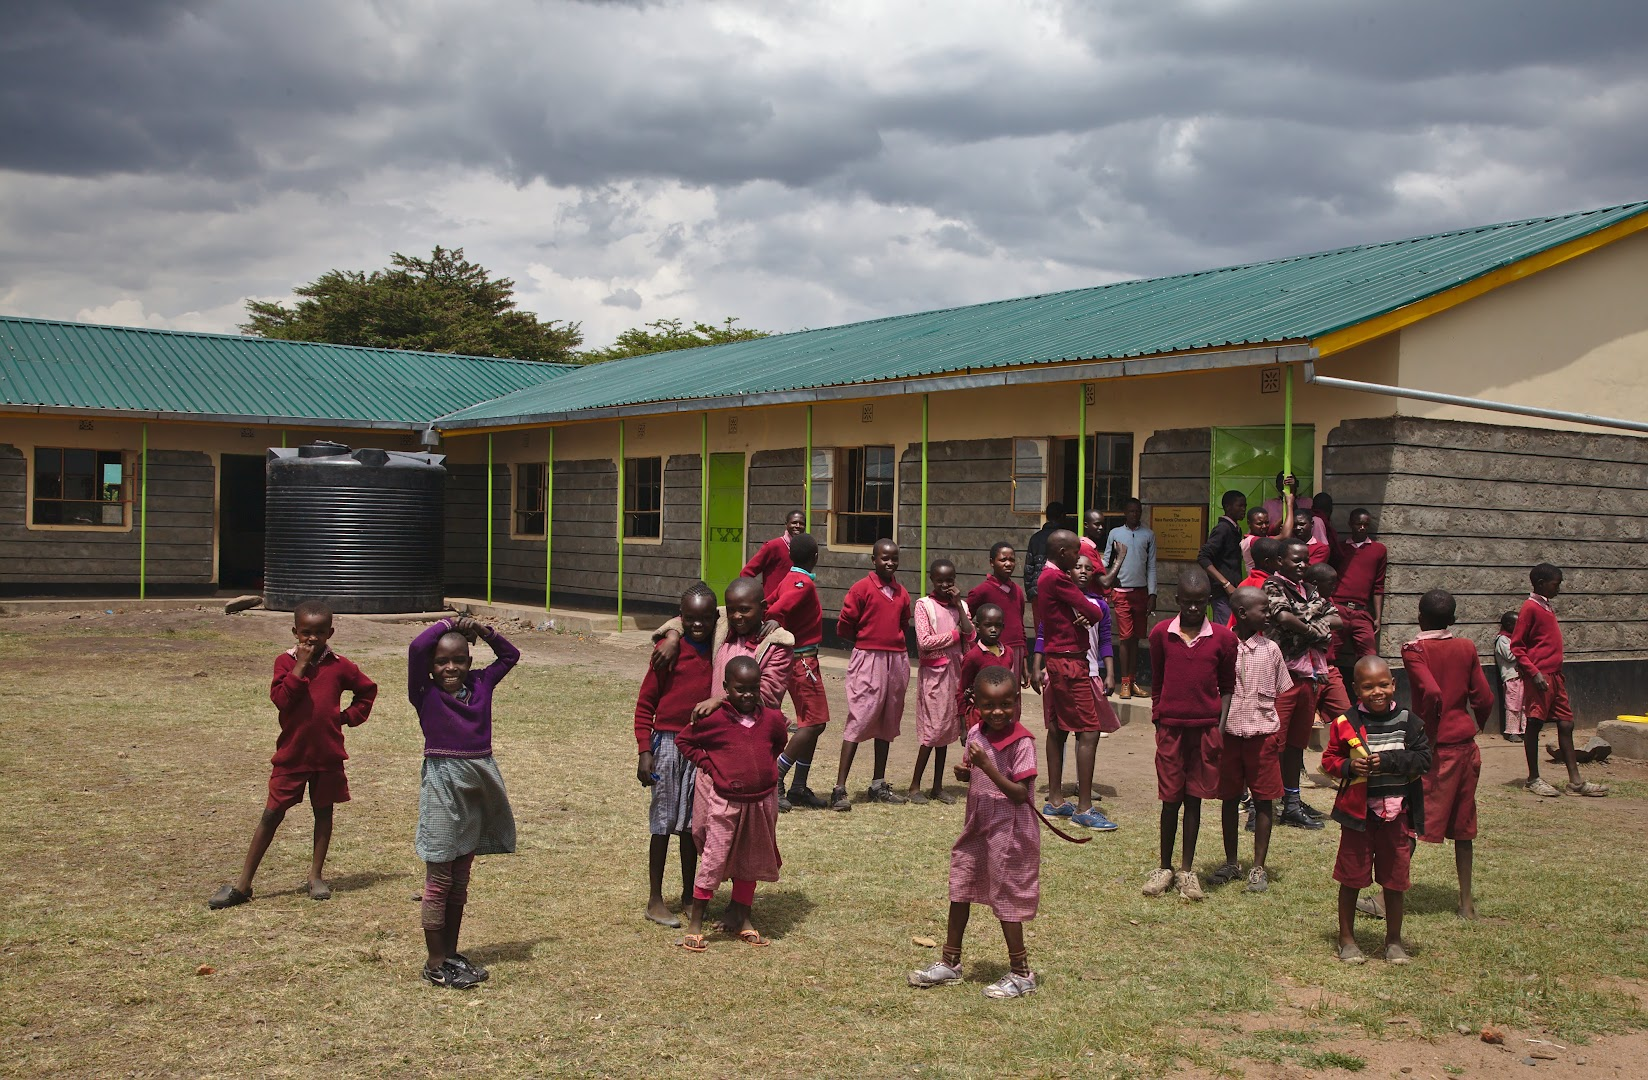 Schoolchildren are having a break